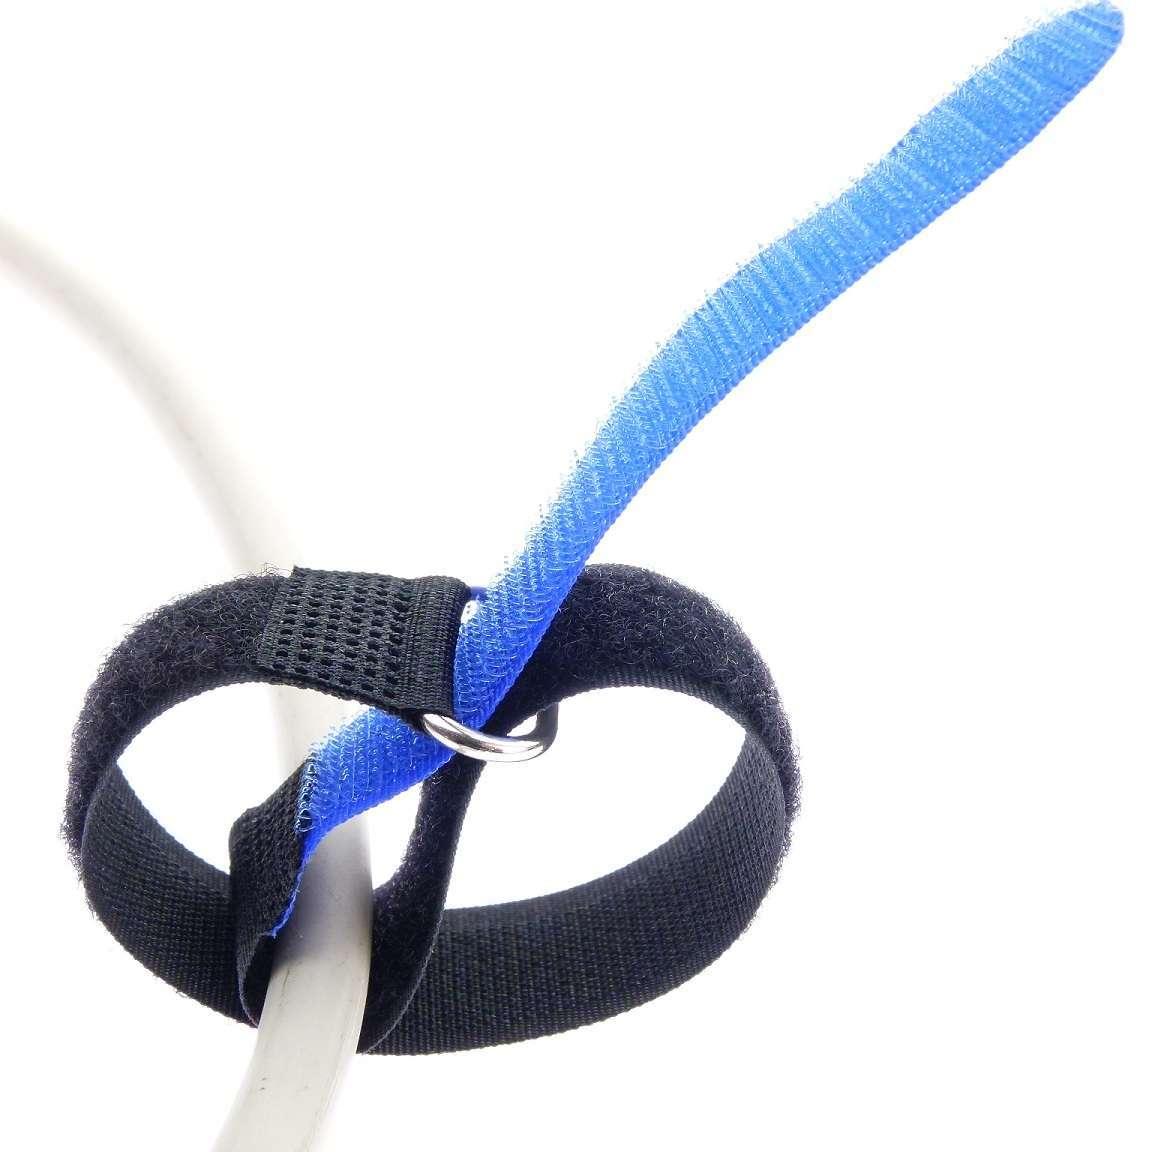 20x Klettband Kabelbinder 16 cm x 16 mm hell blau Klettbänder Kabelklettband Öse